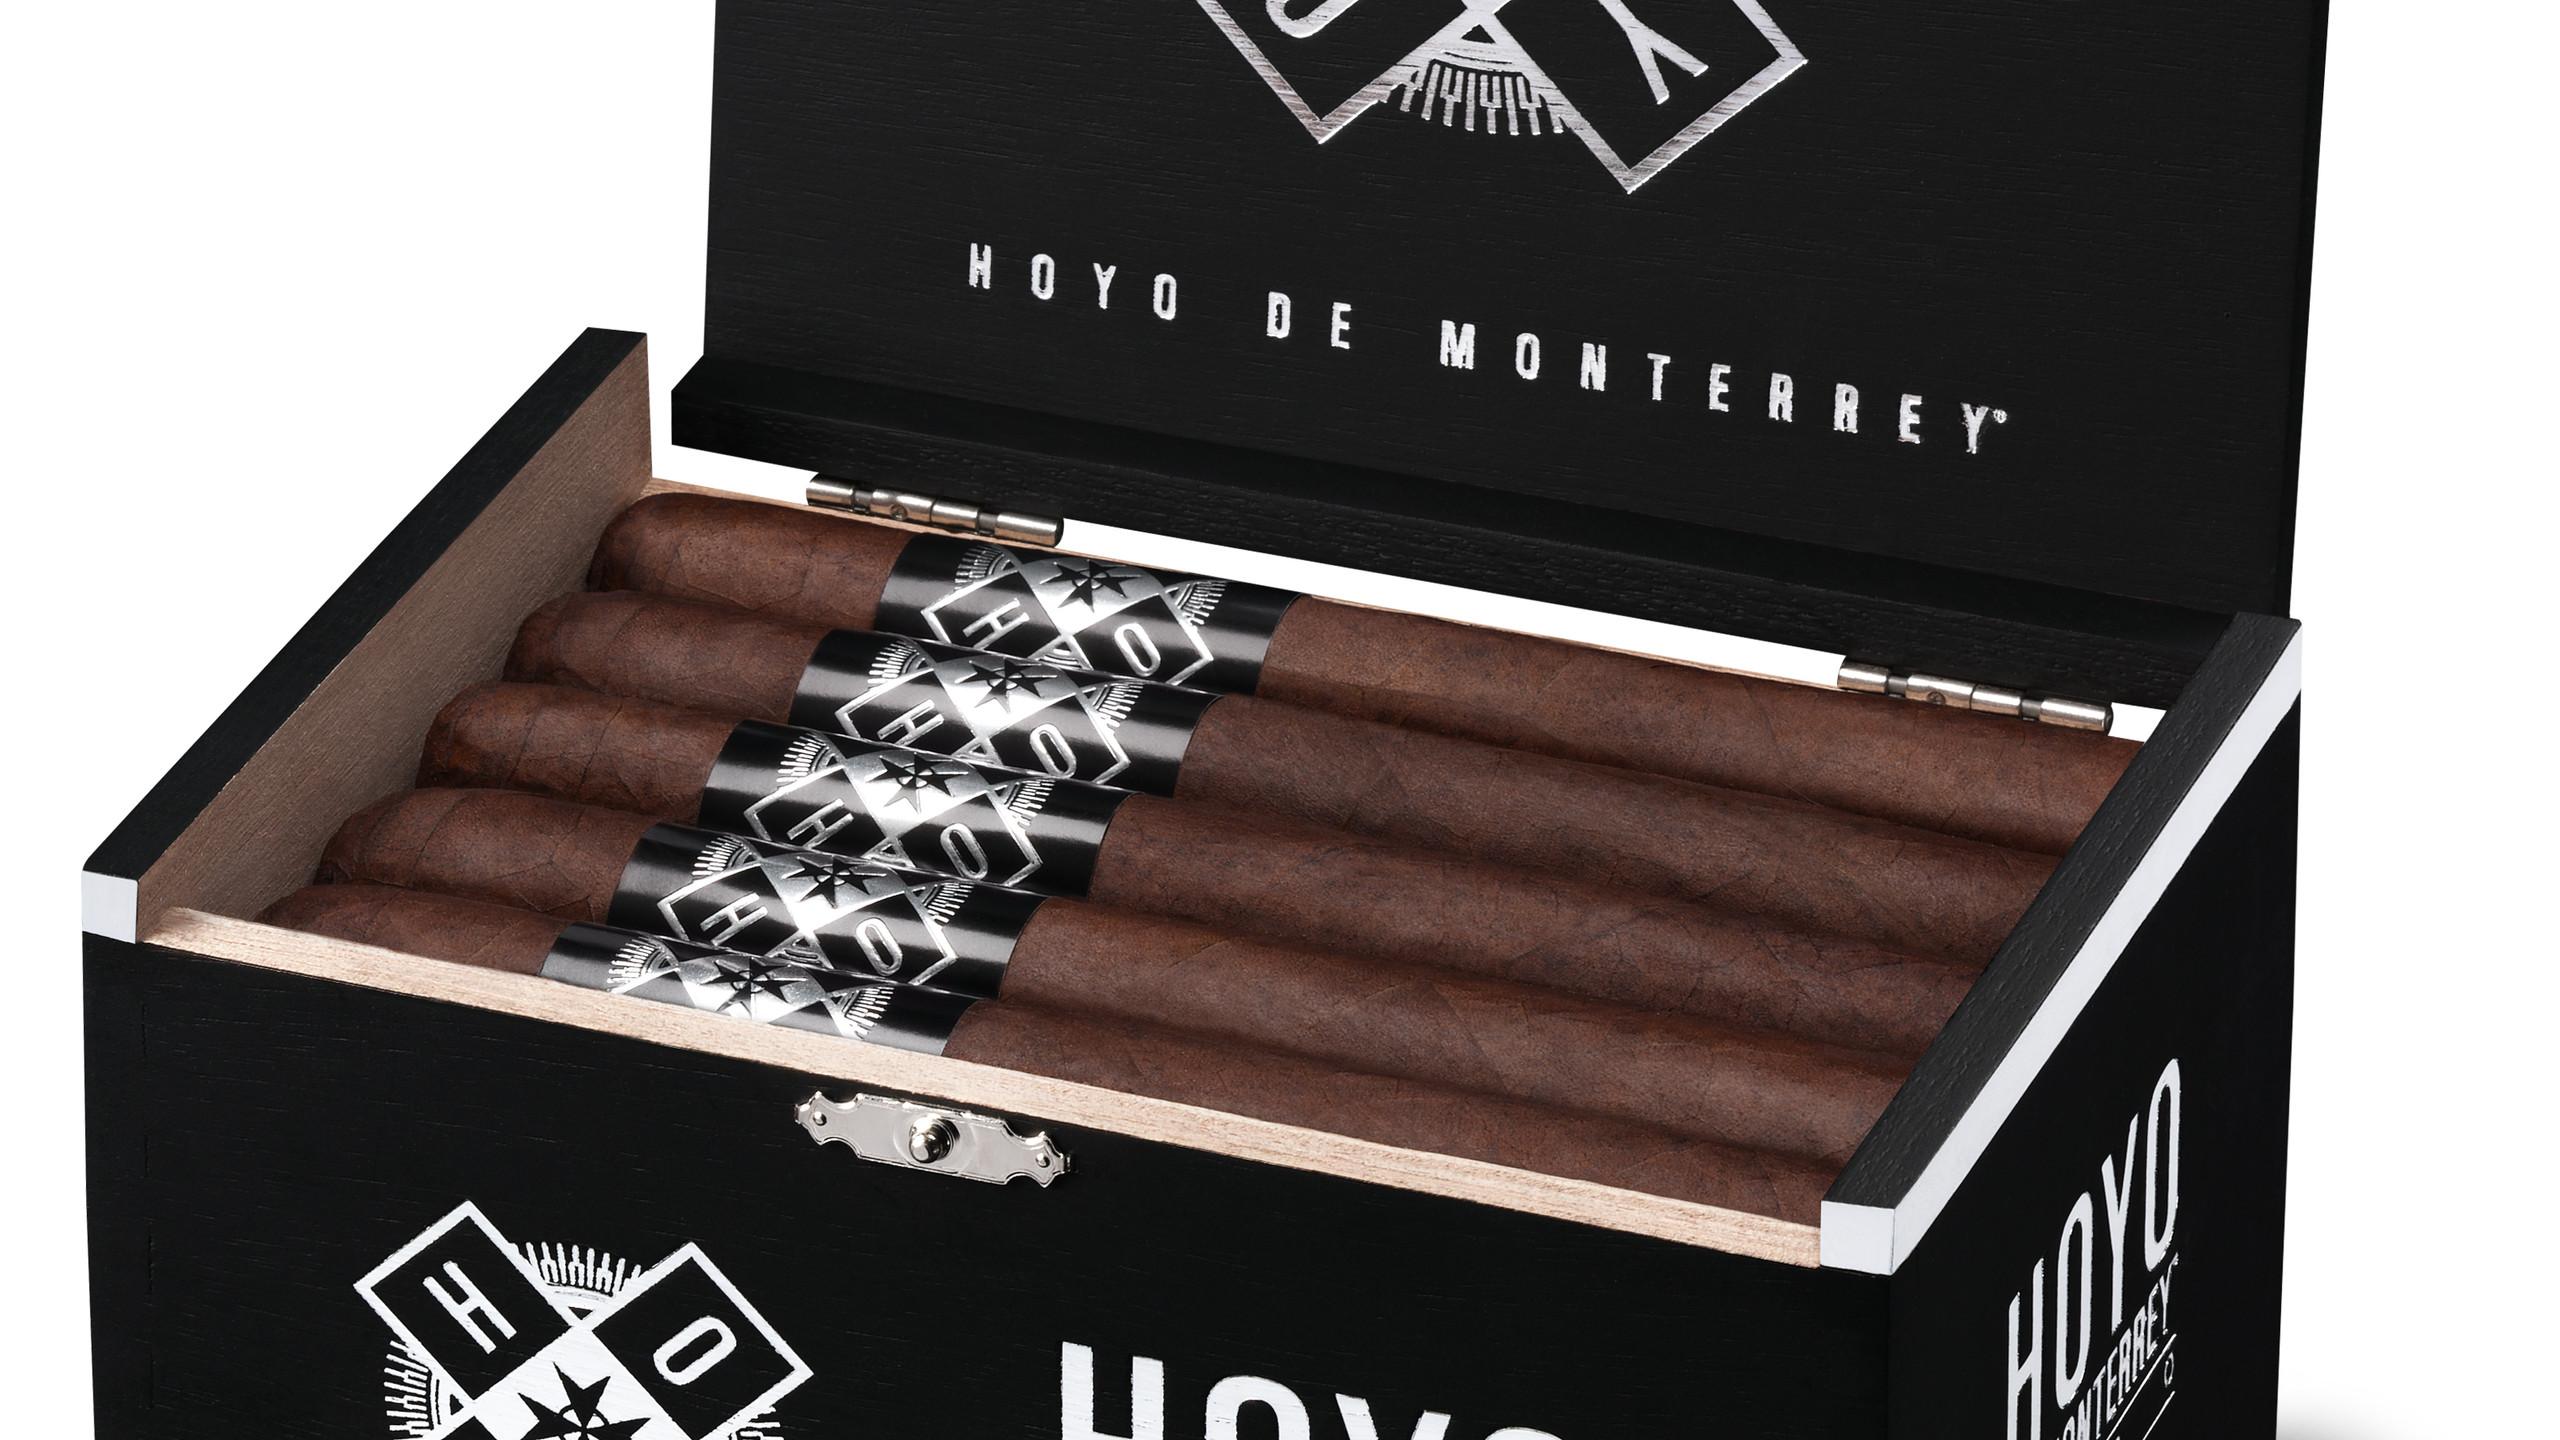 New Hoyo de Monterrey Toro box